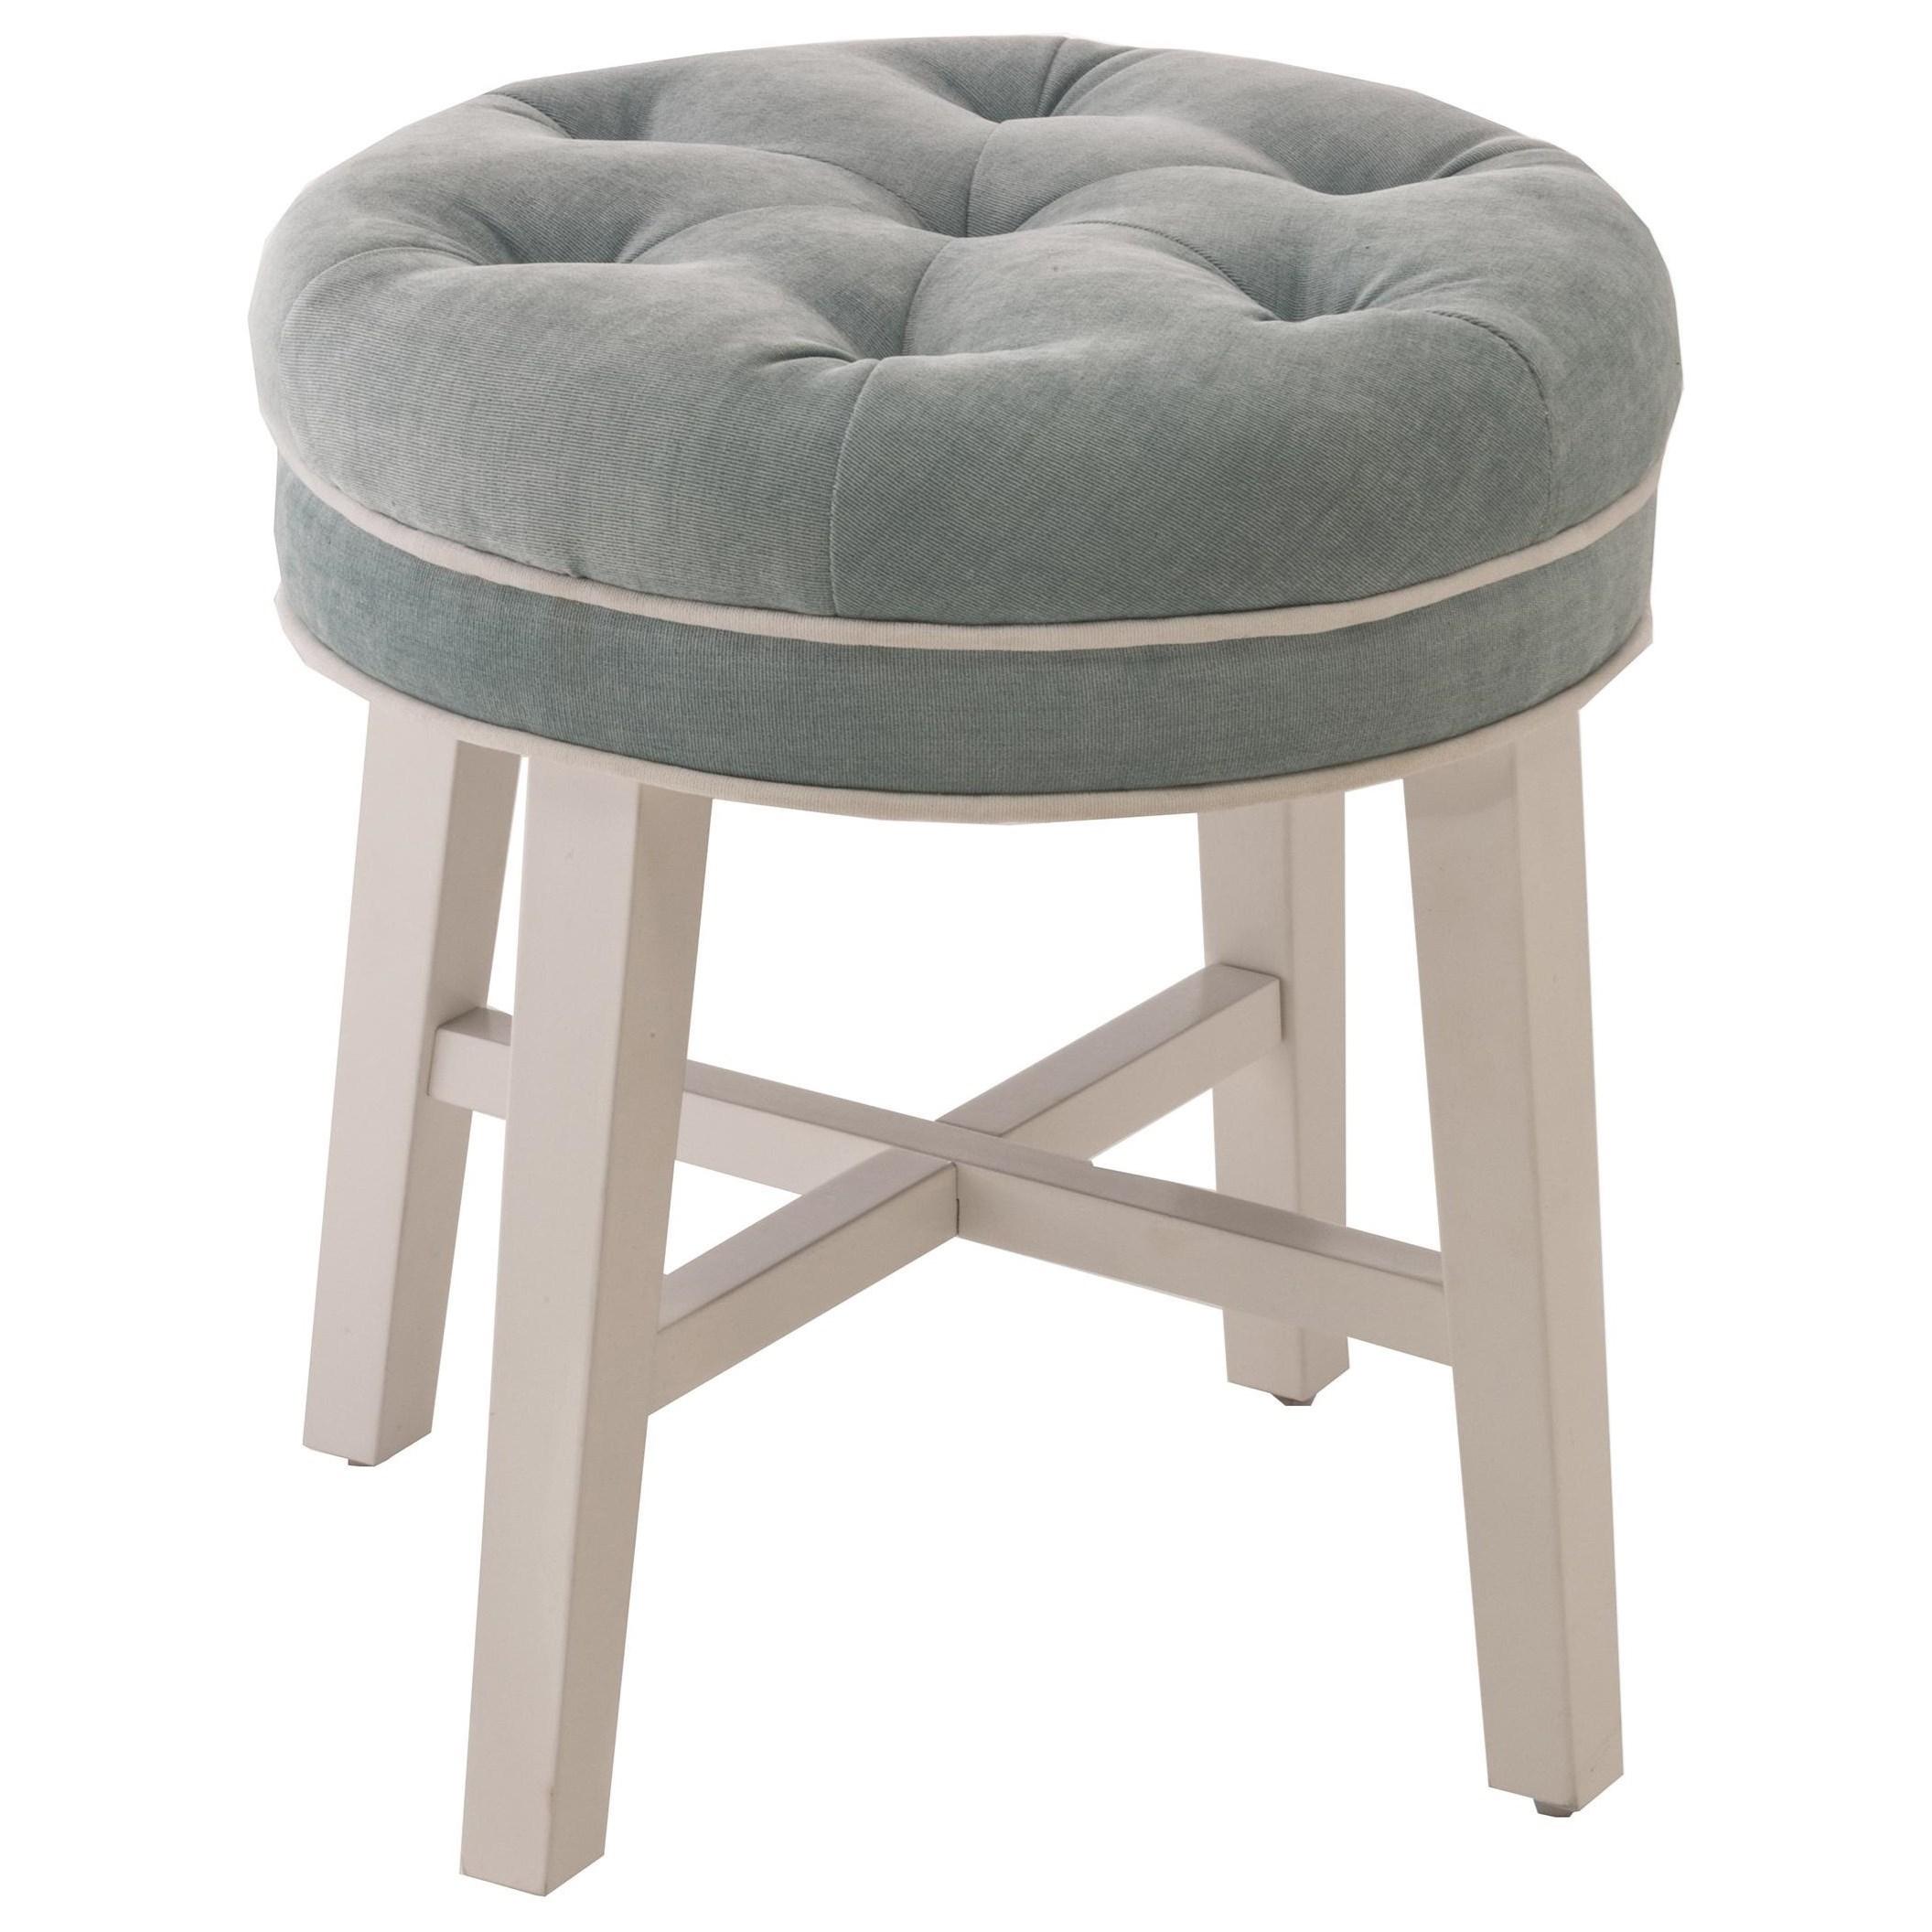 Superieur Hillsdale Vanity StoolsSophia Vanity Stool With Fabric Seat ...